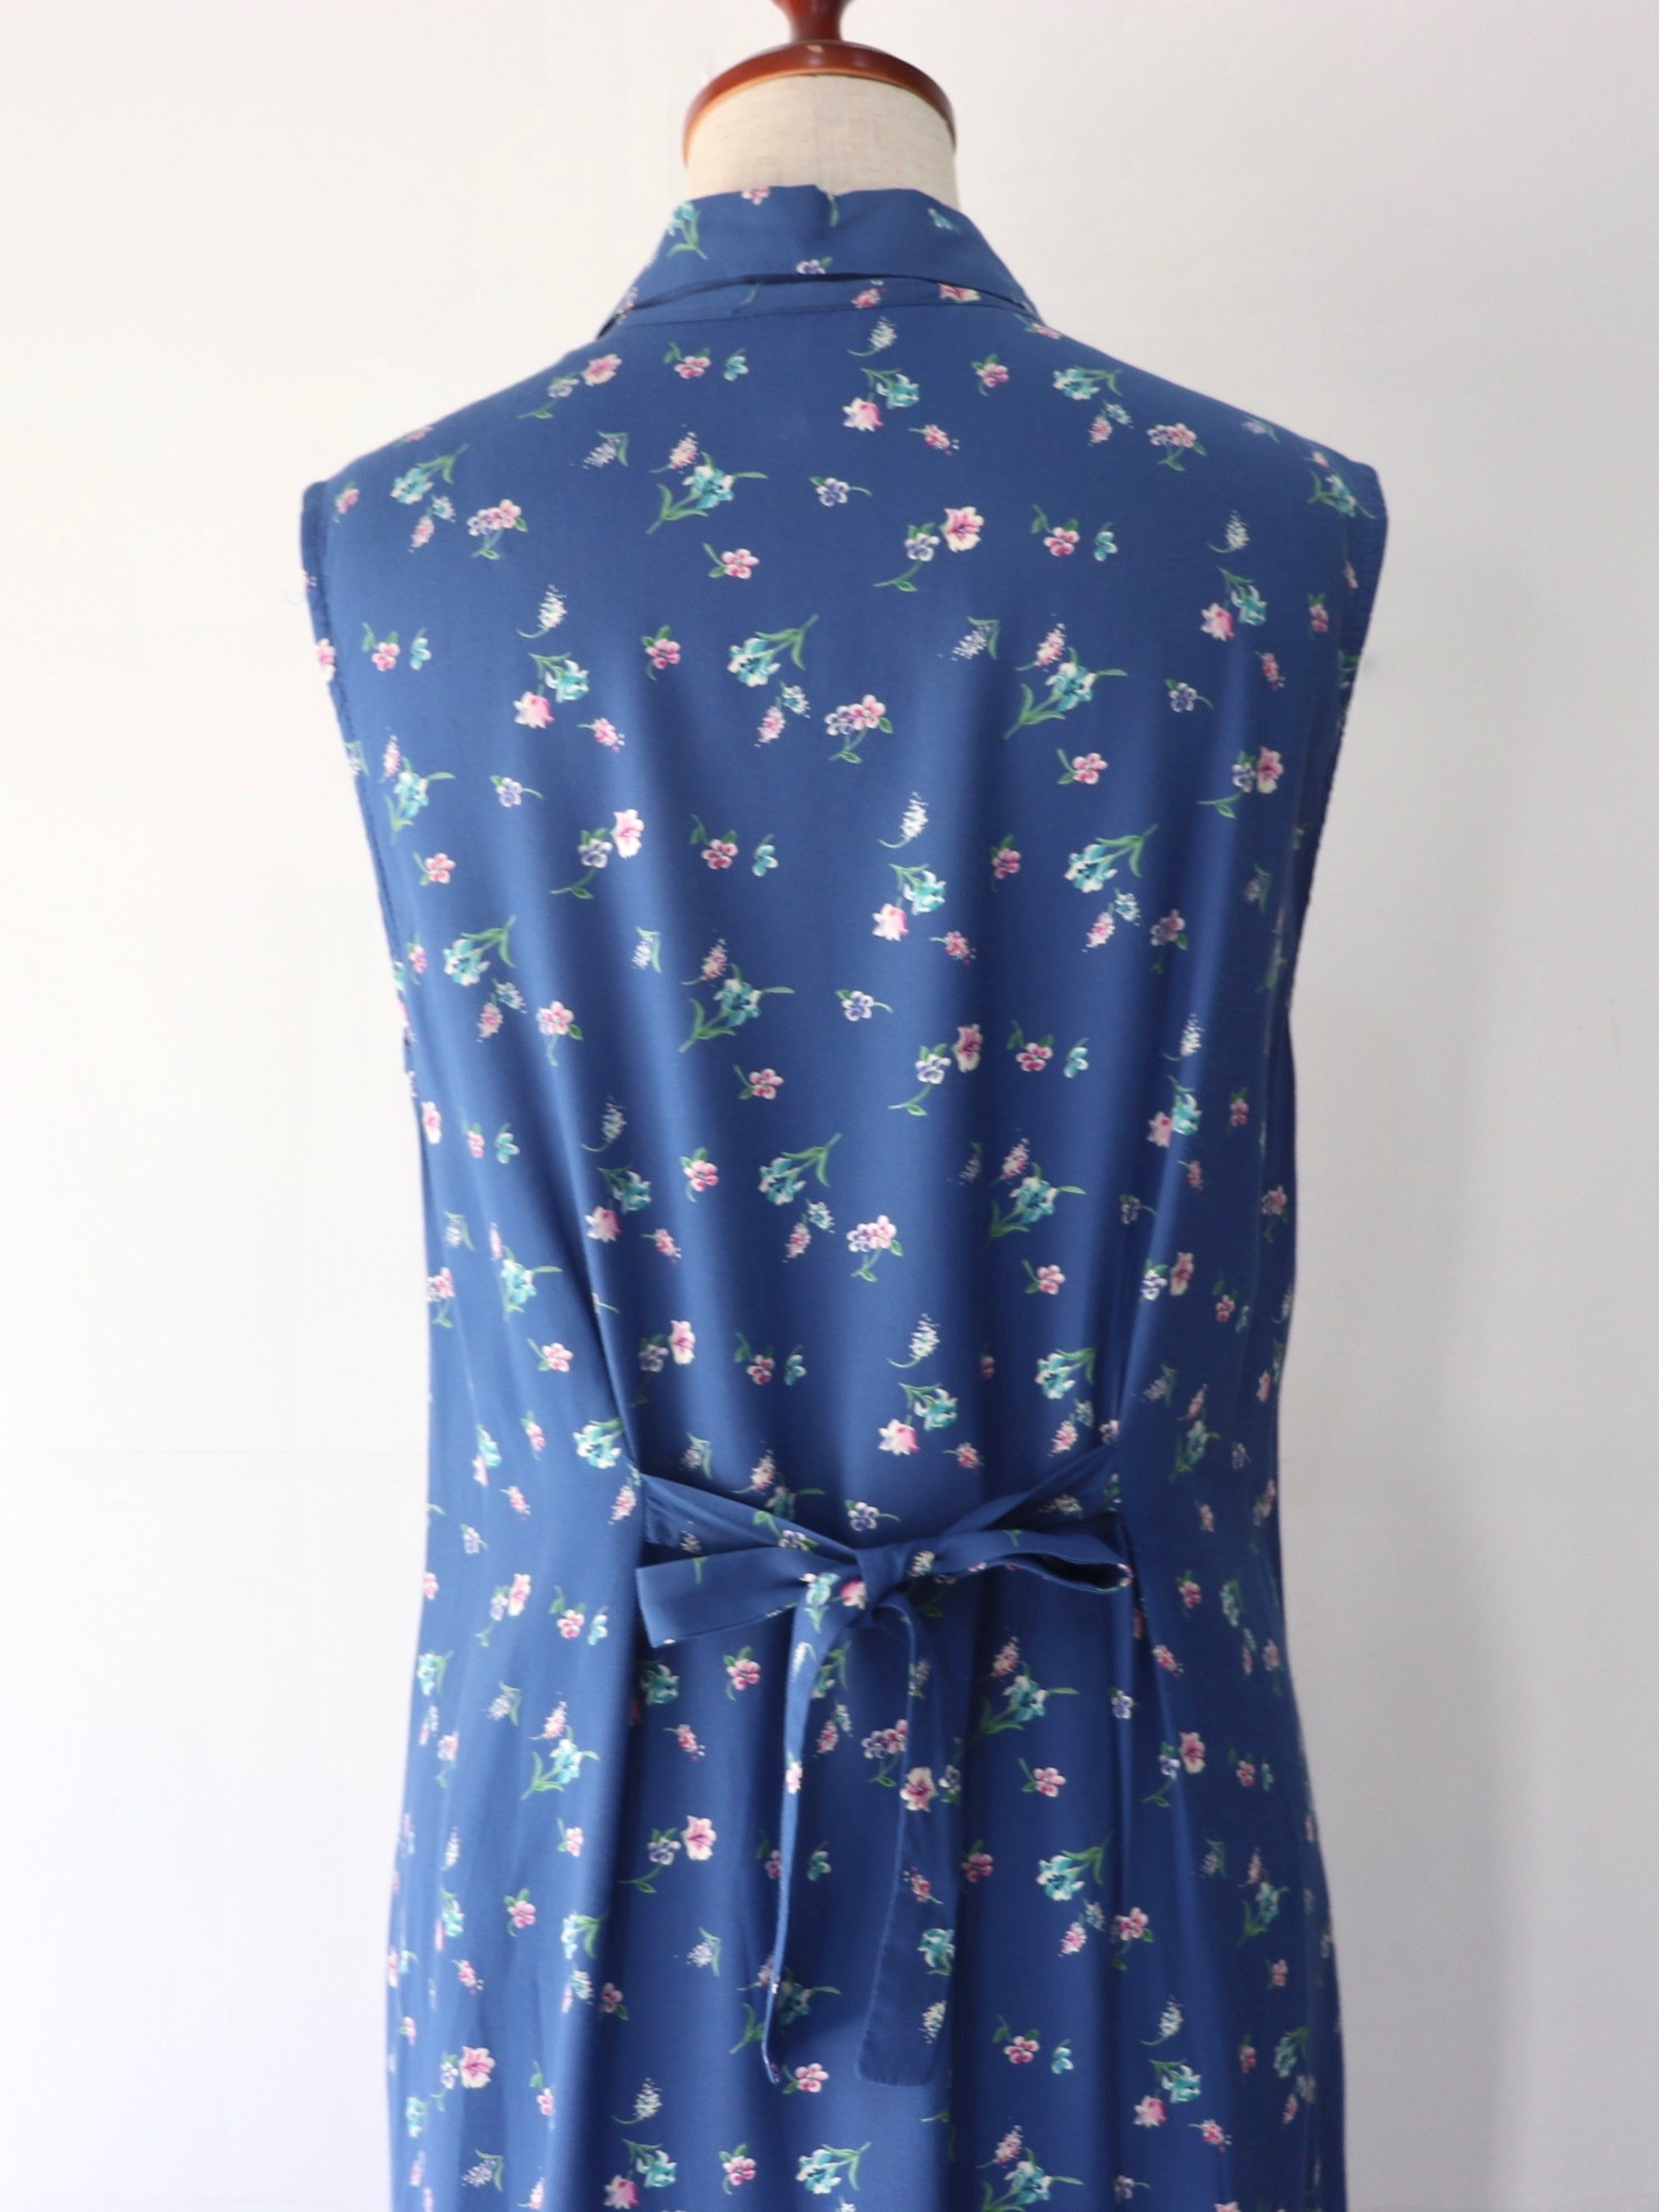 【MARKET】Open collar flower pattern one-piece